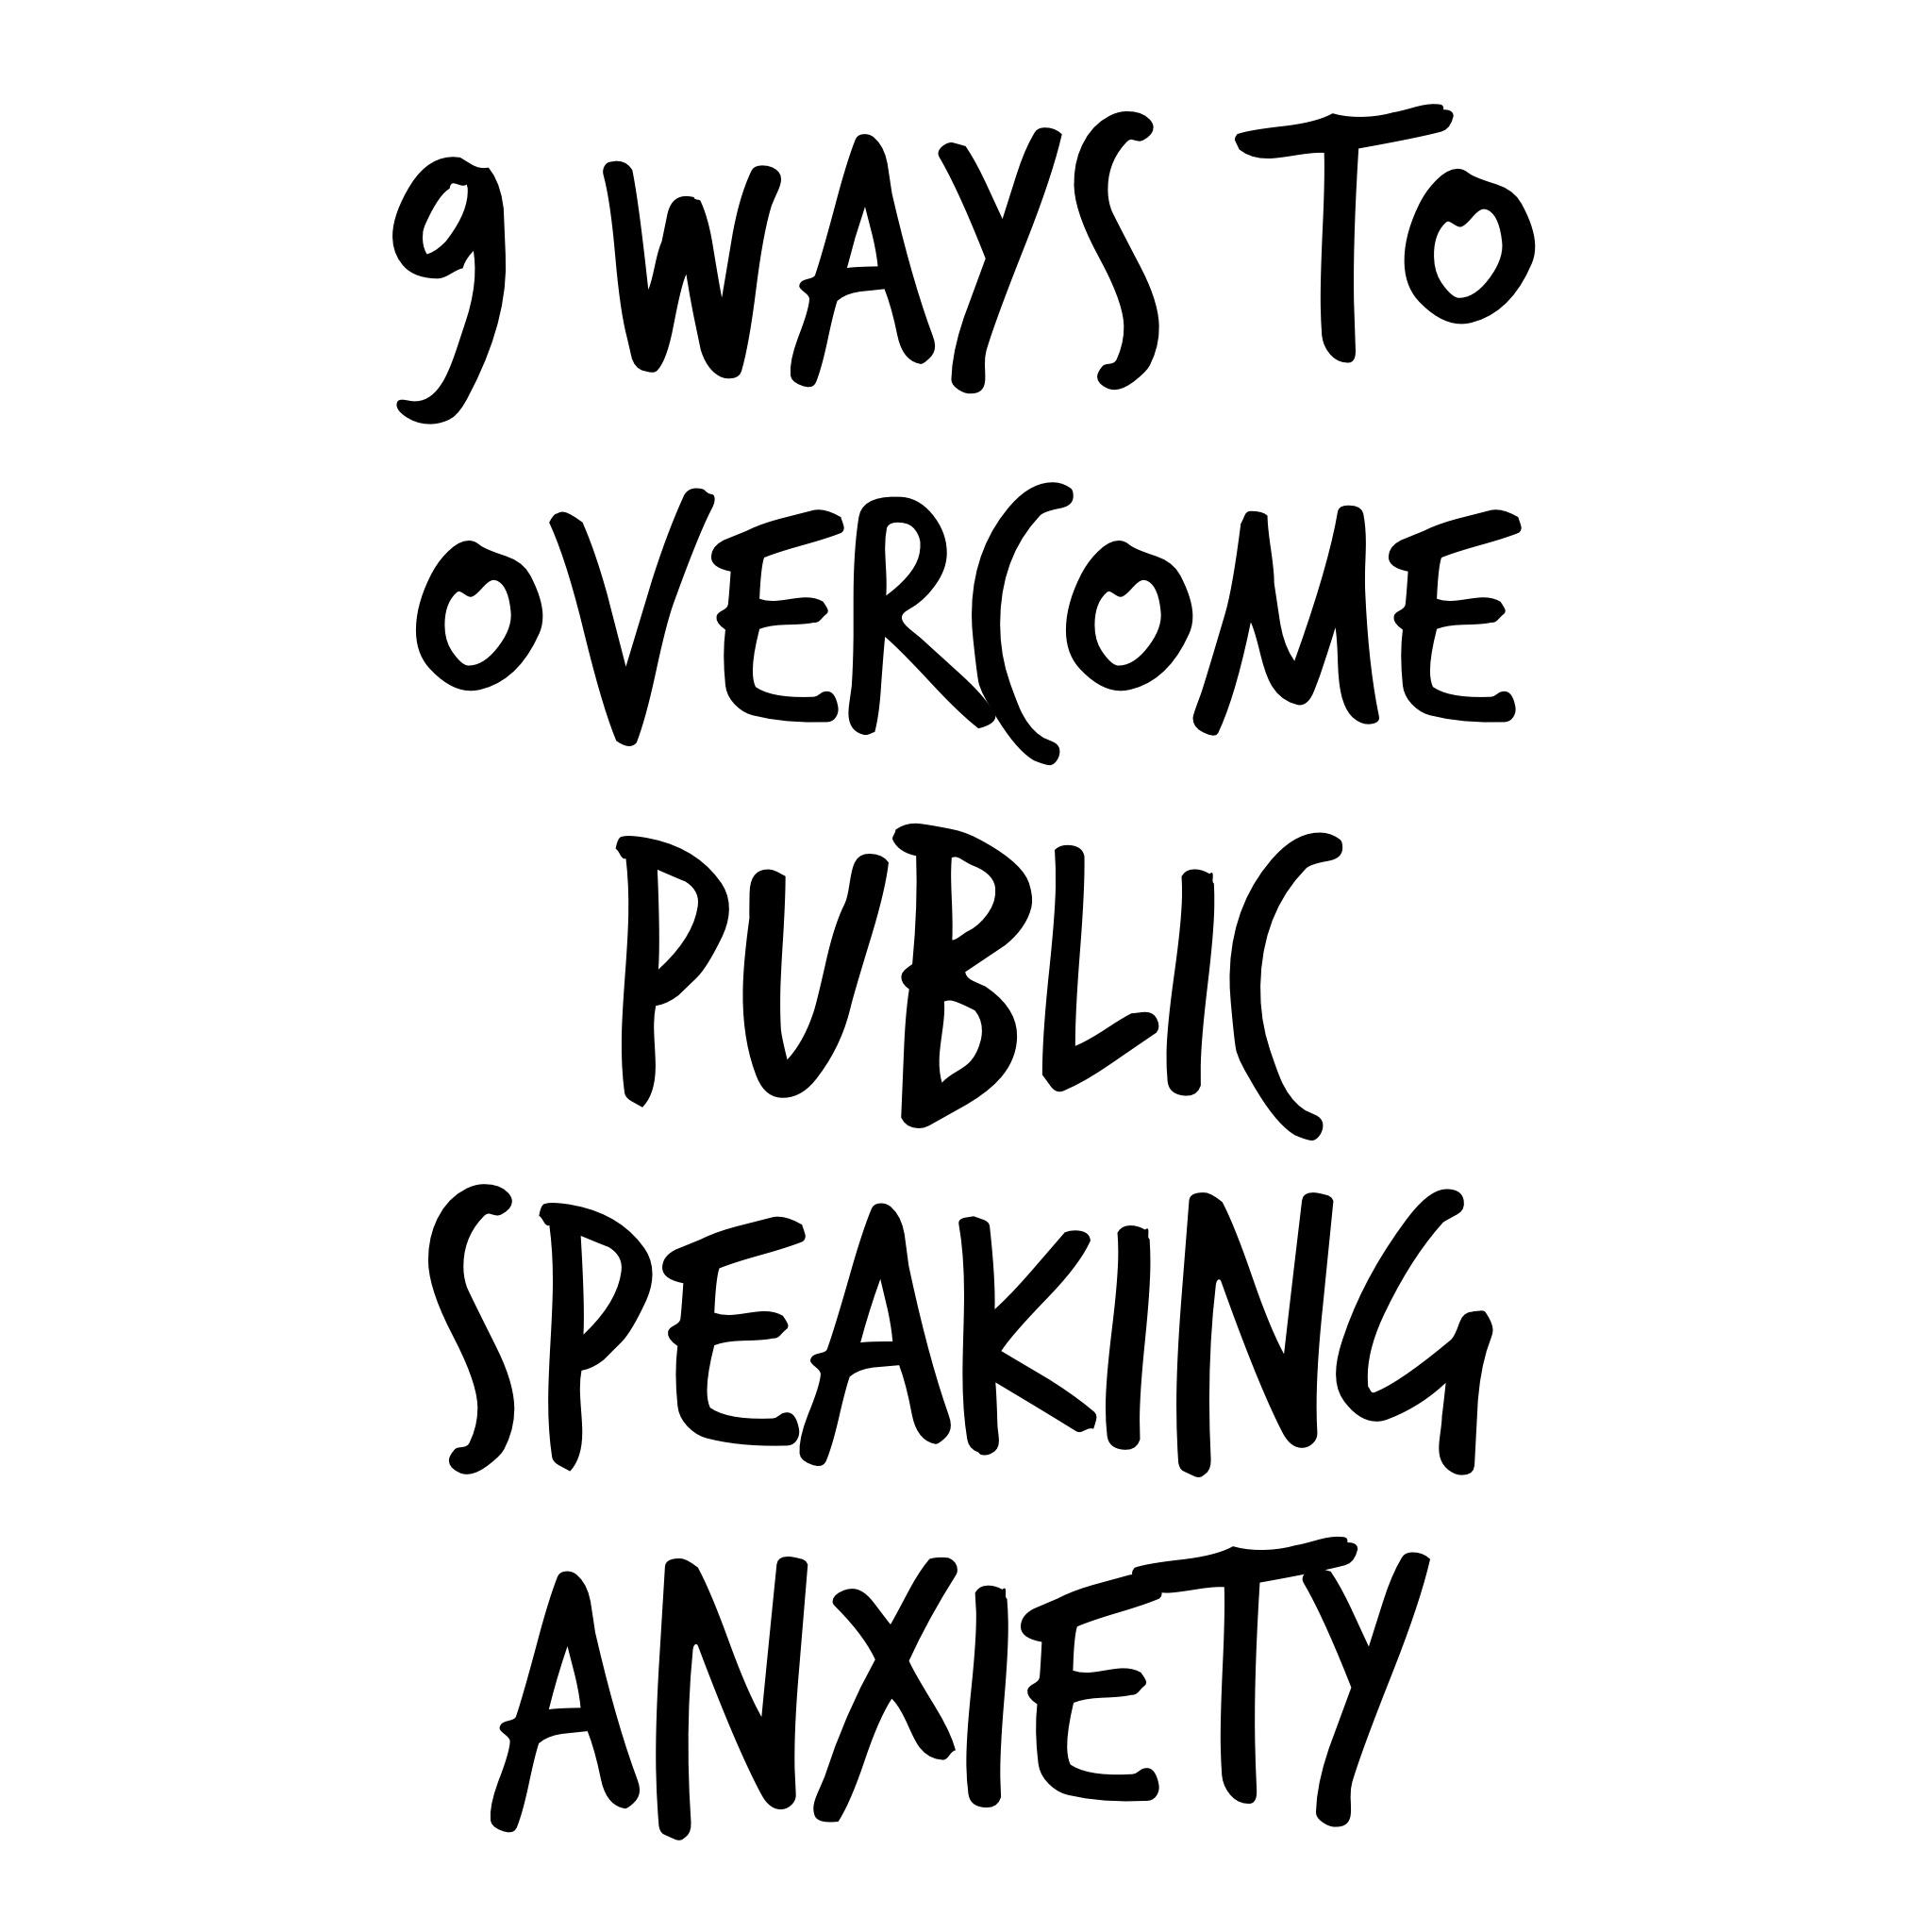 public_speaking_anxiety